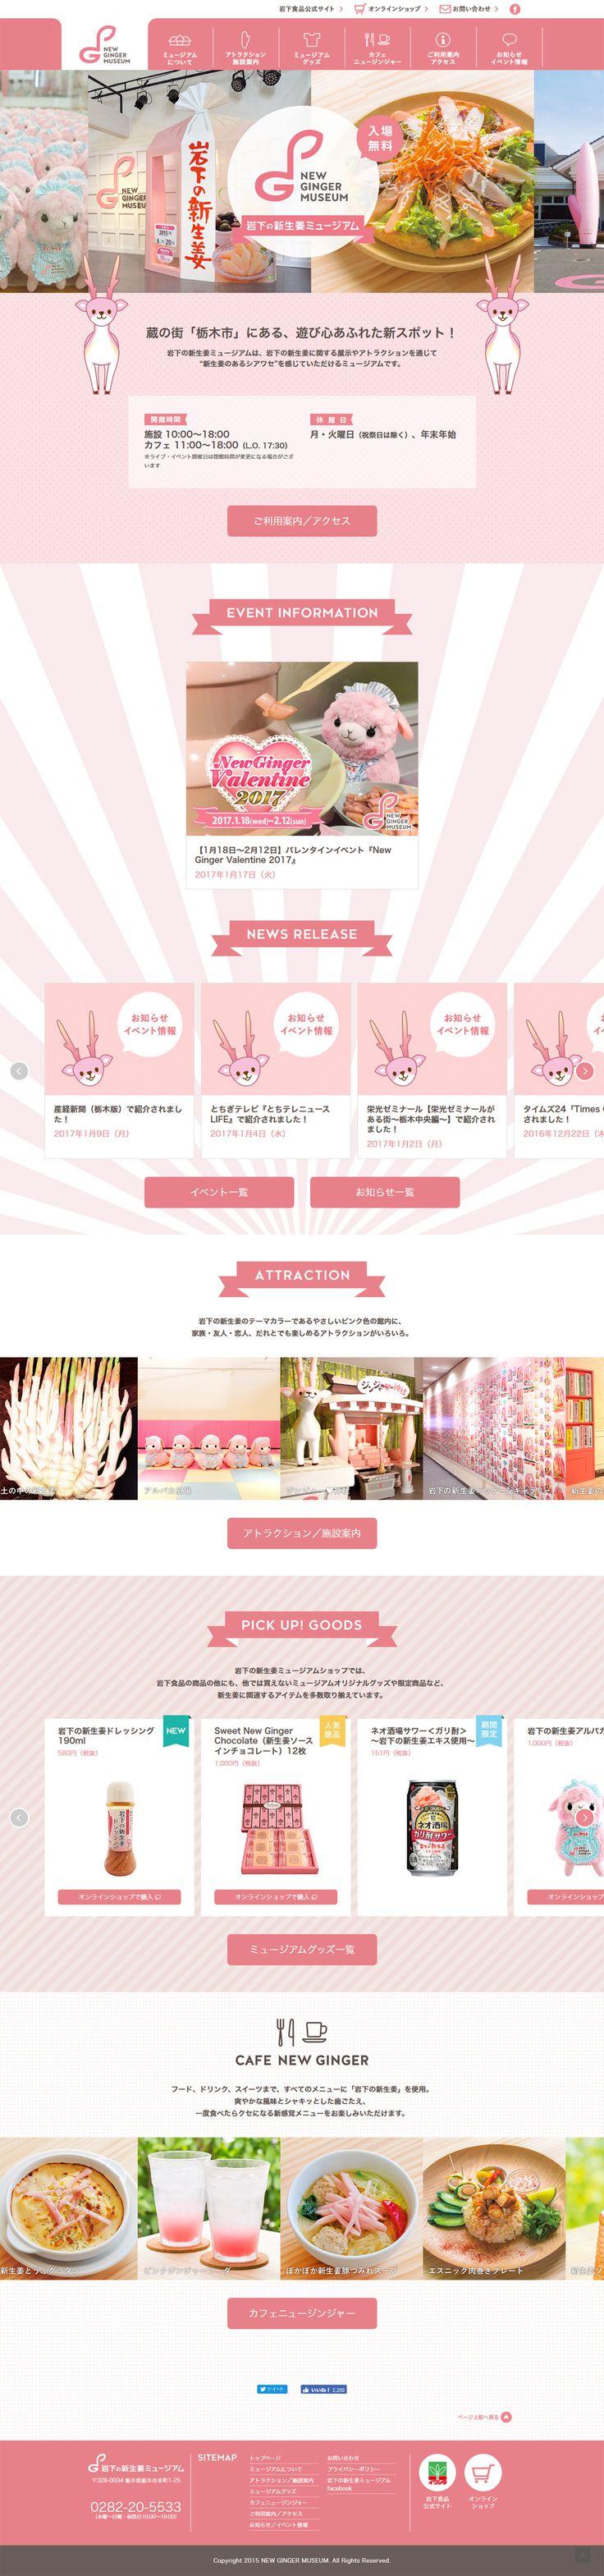 las 979 mejores imágenes sobre webデザイン en pinterest